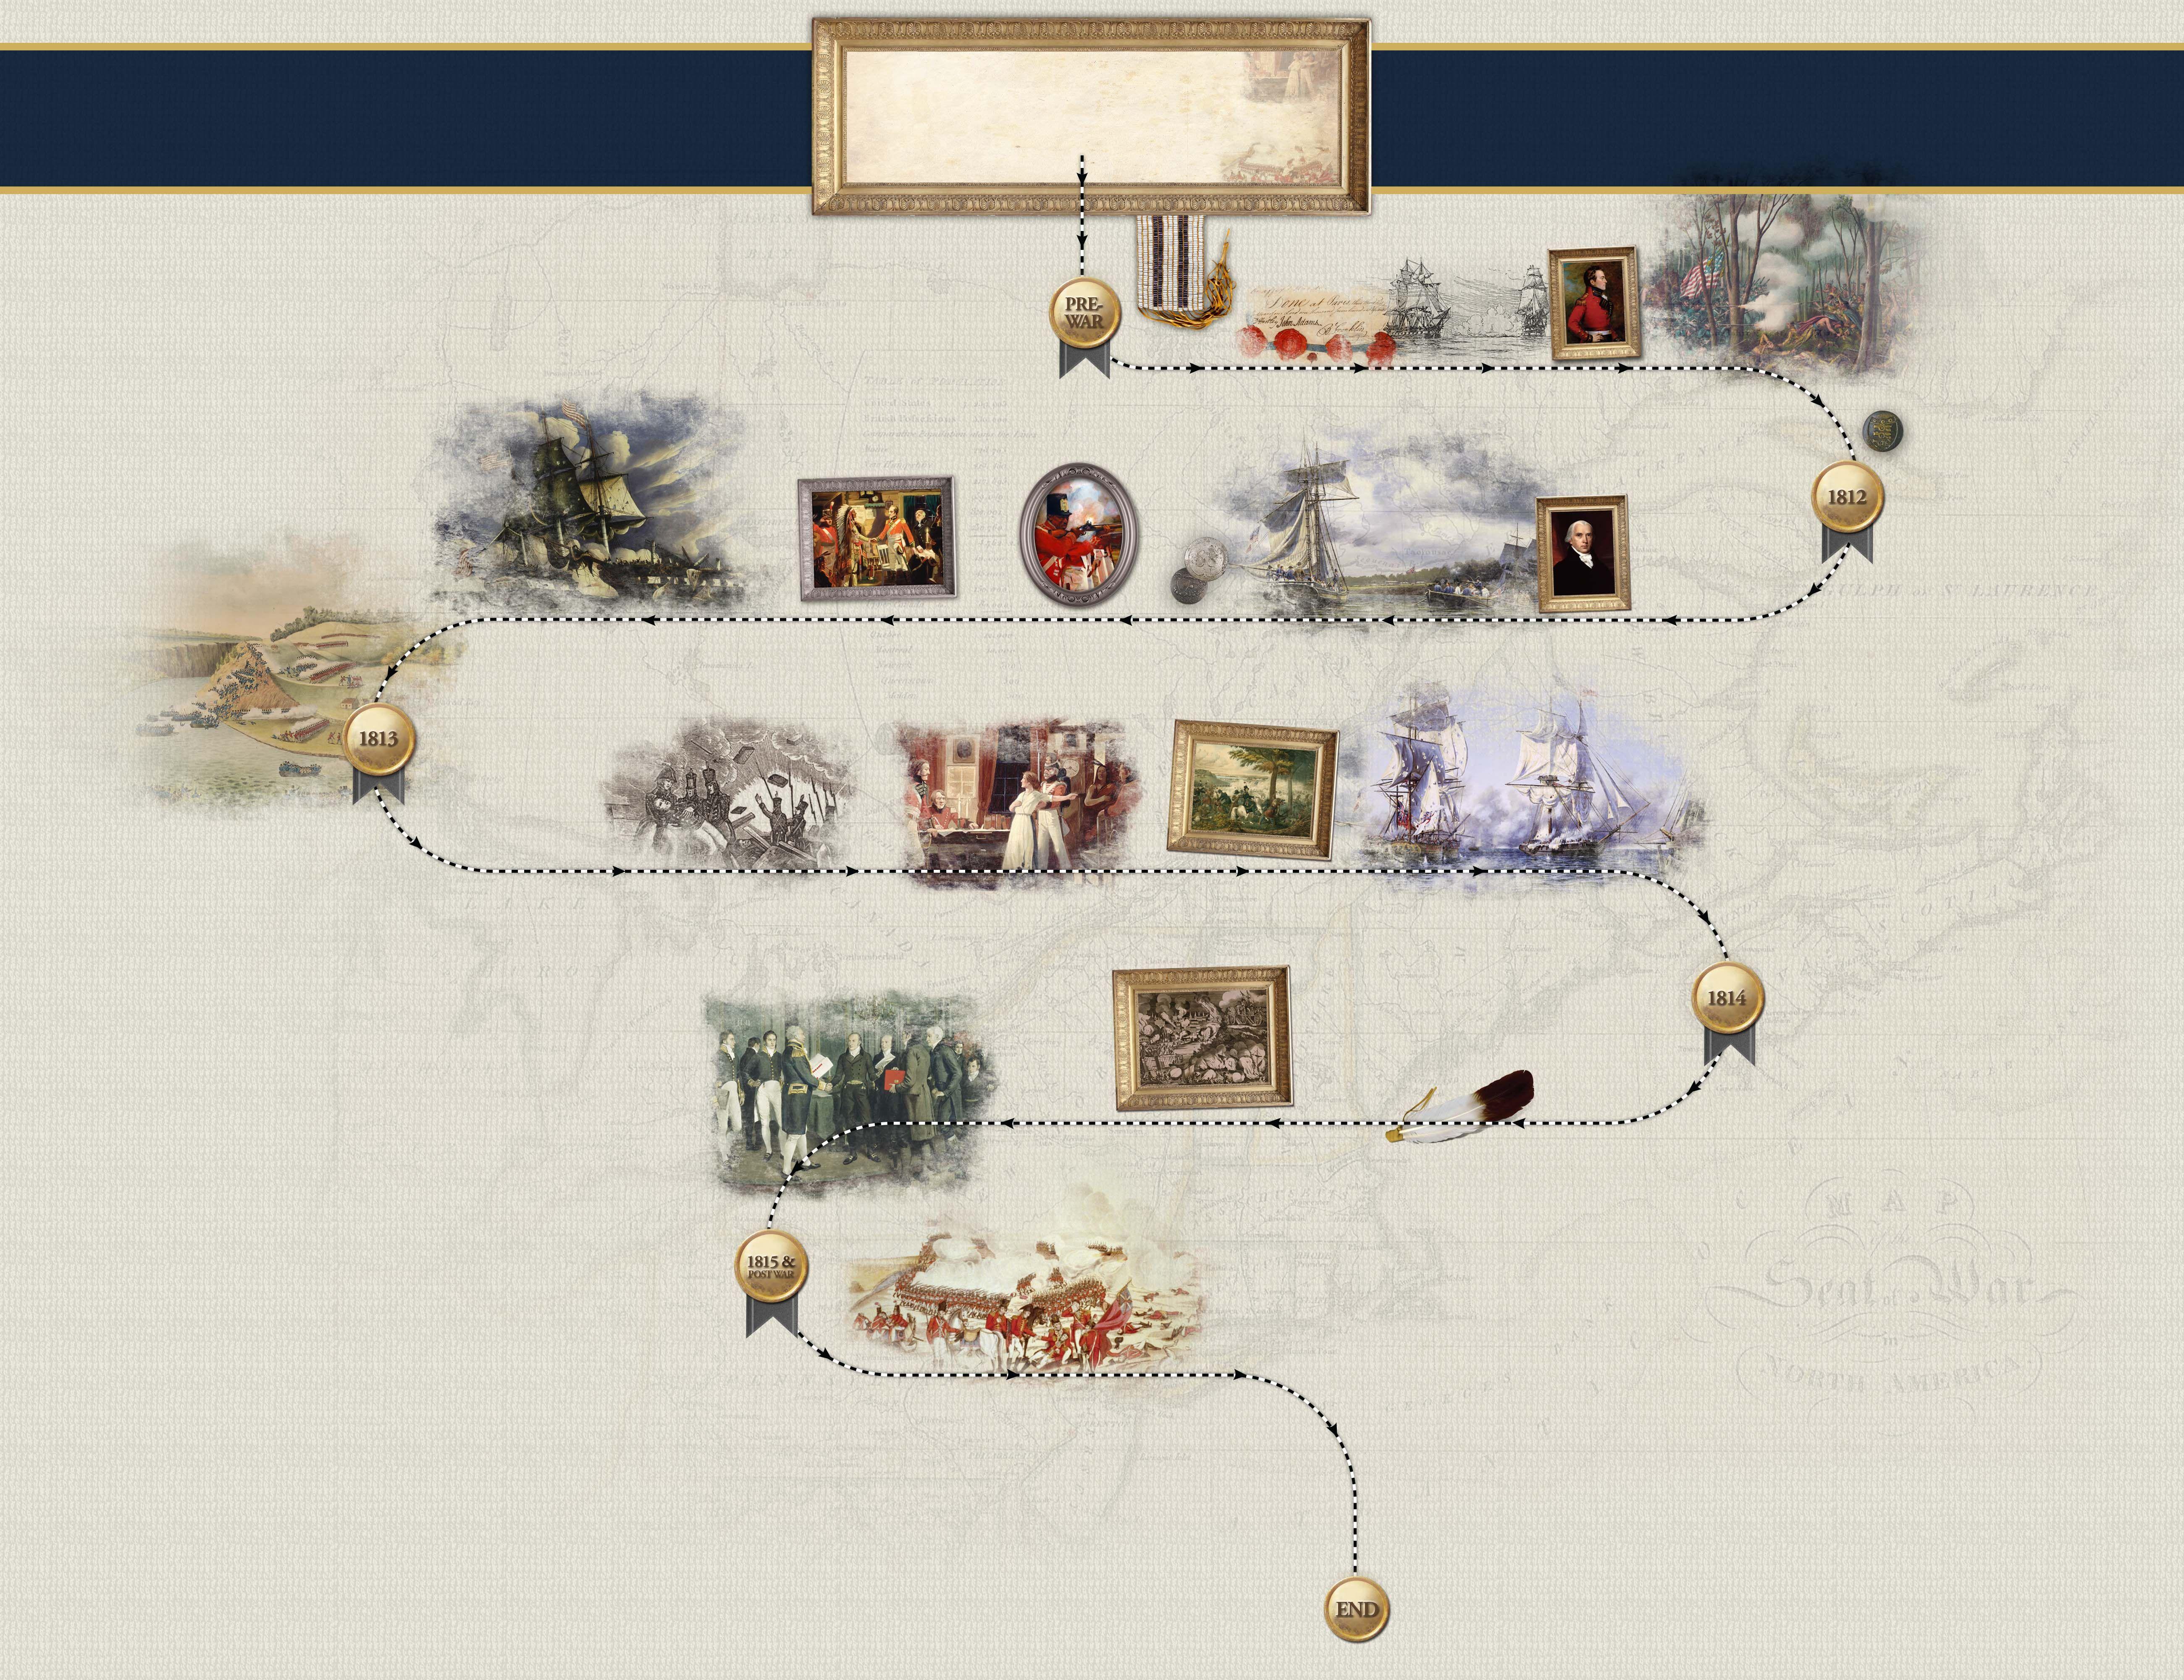 War of 1812 Interactive Timeline | War of 1812 | Pinterest | 1812 ...